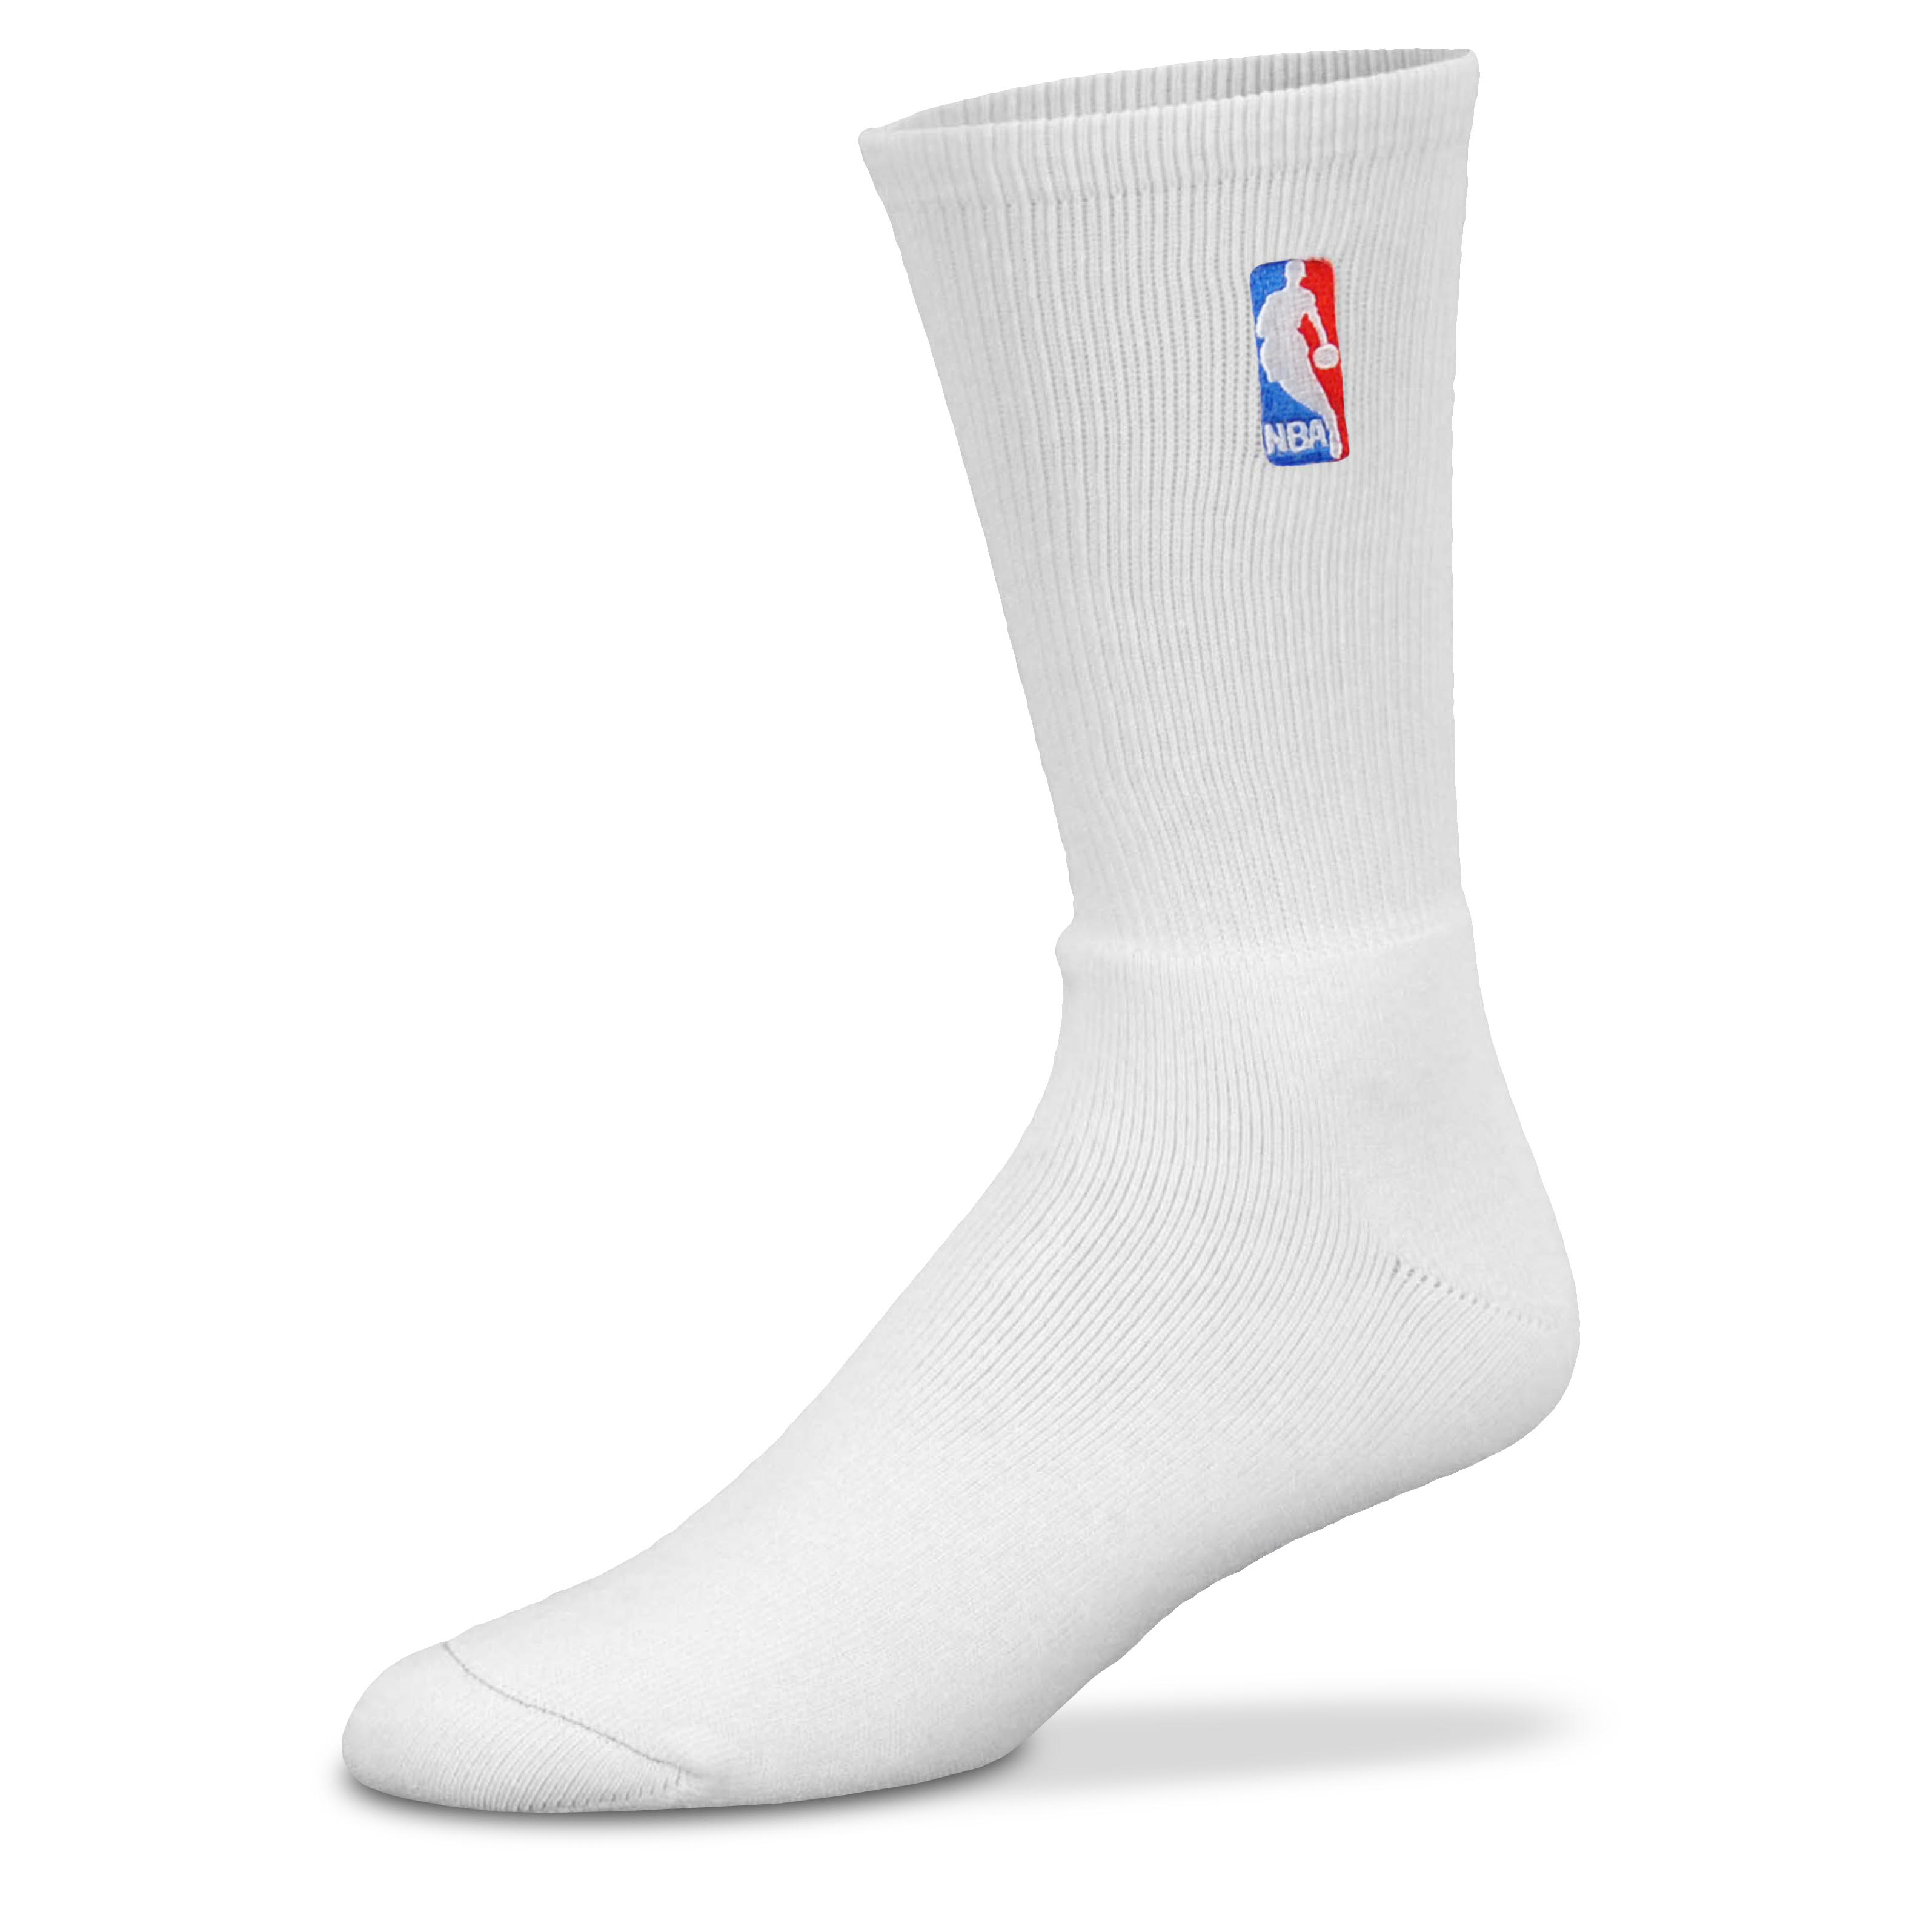 NBA Logoman Crew Sock - White